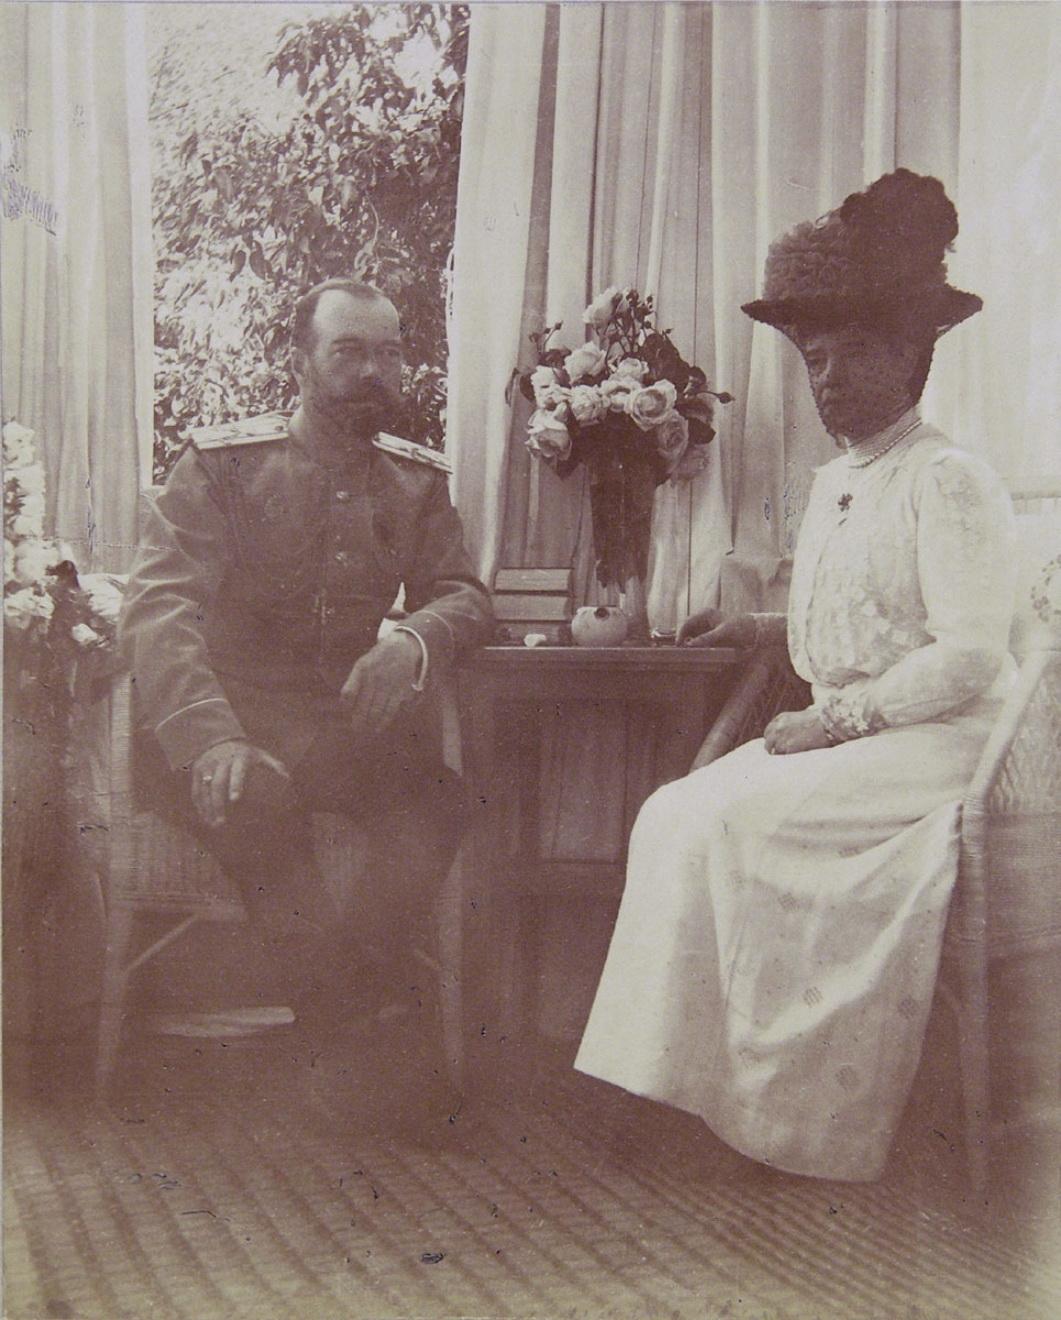 1914. Елагин дворец. Николай II и Мария Фёдоровна